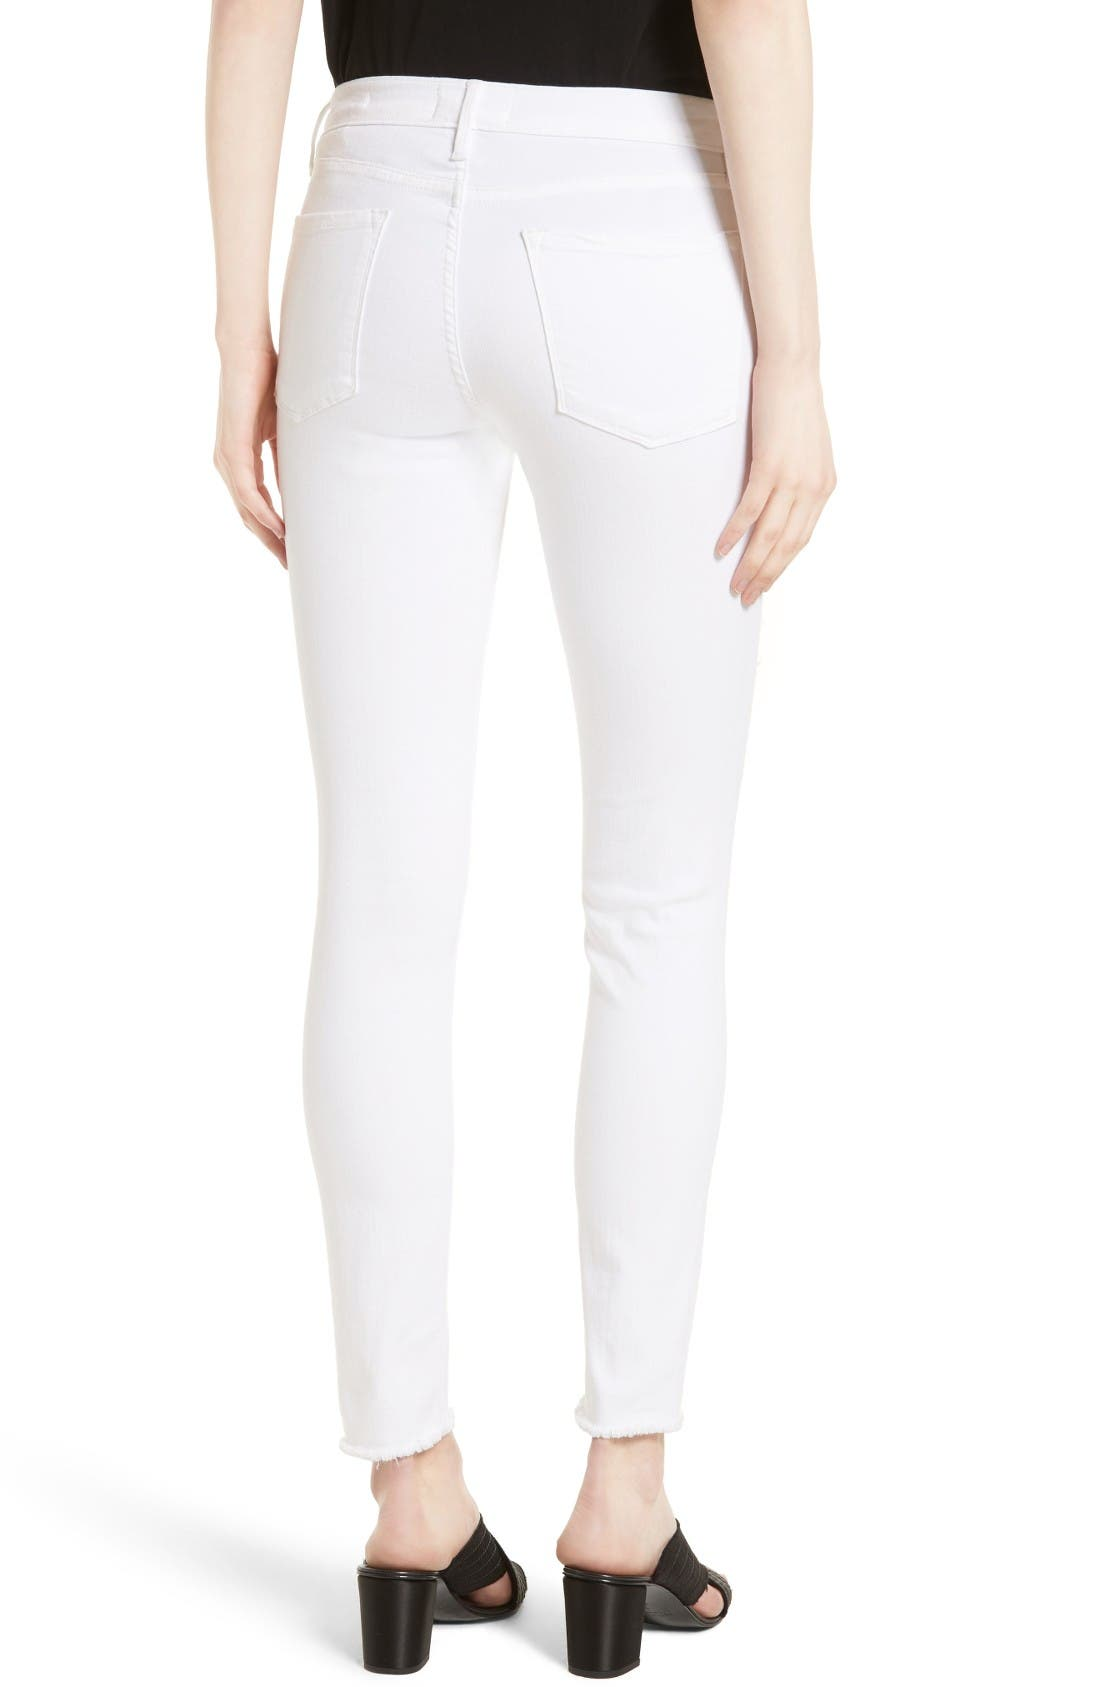 Alternate Image 2  - FRAME 'Le Skinny de Jeanne' Ripped Jeans (Noir Jefferson) (Nordstrom Exclusive)